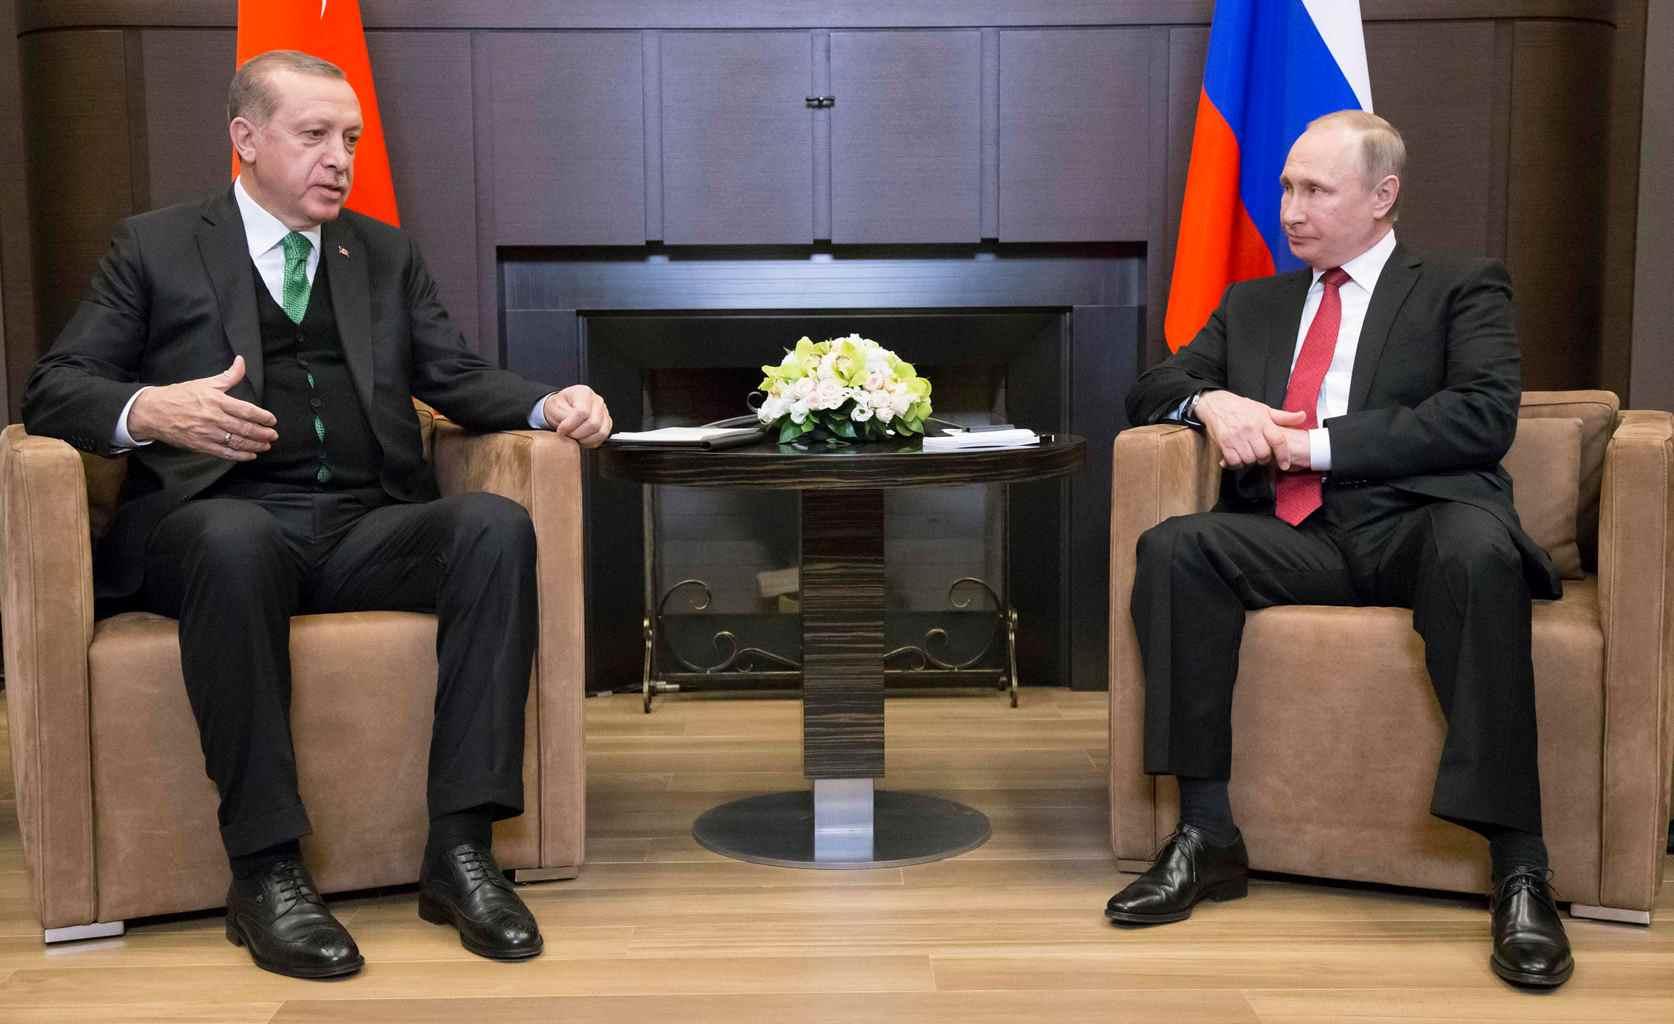 Russian President Vladimir Putin meets with his Turkish counterpart Tayyip Erdogan in Sochi, May 3, 2017.